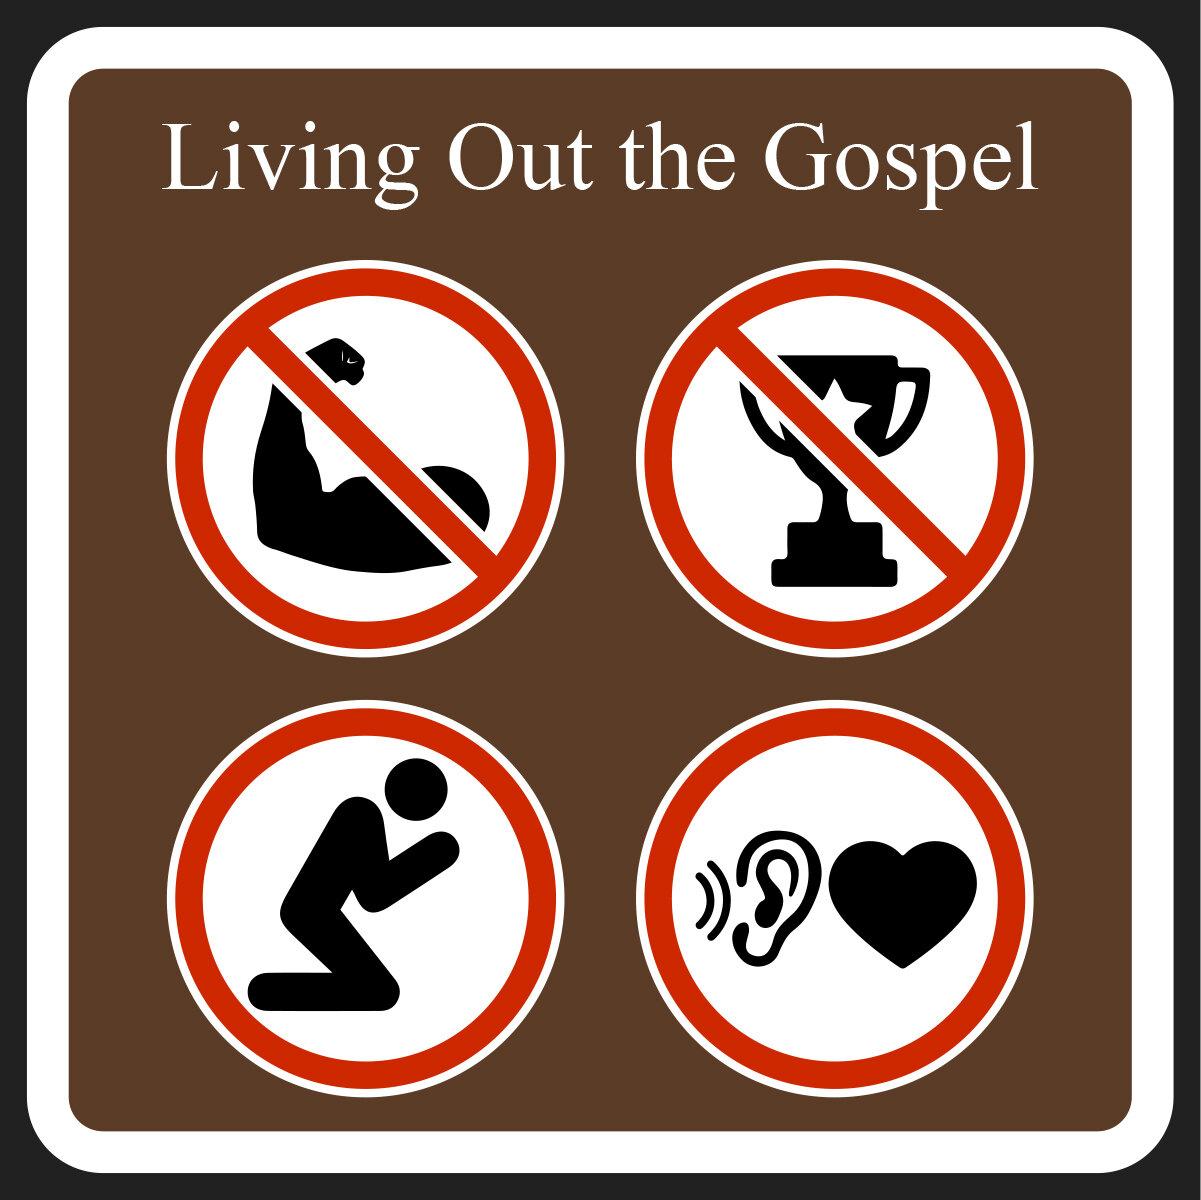 LivingOutTheGospel(Galatians.Sept.2019).jpg